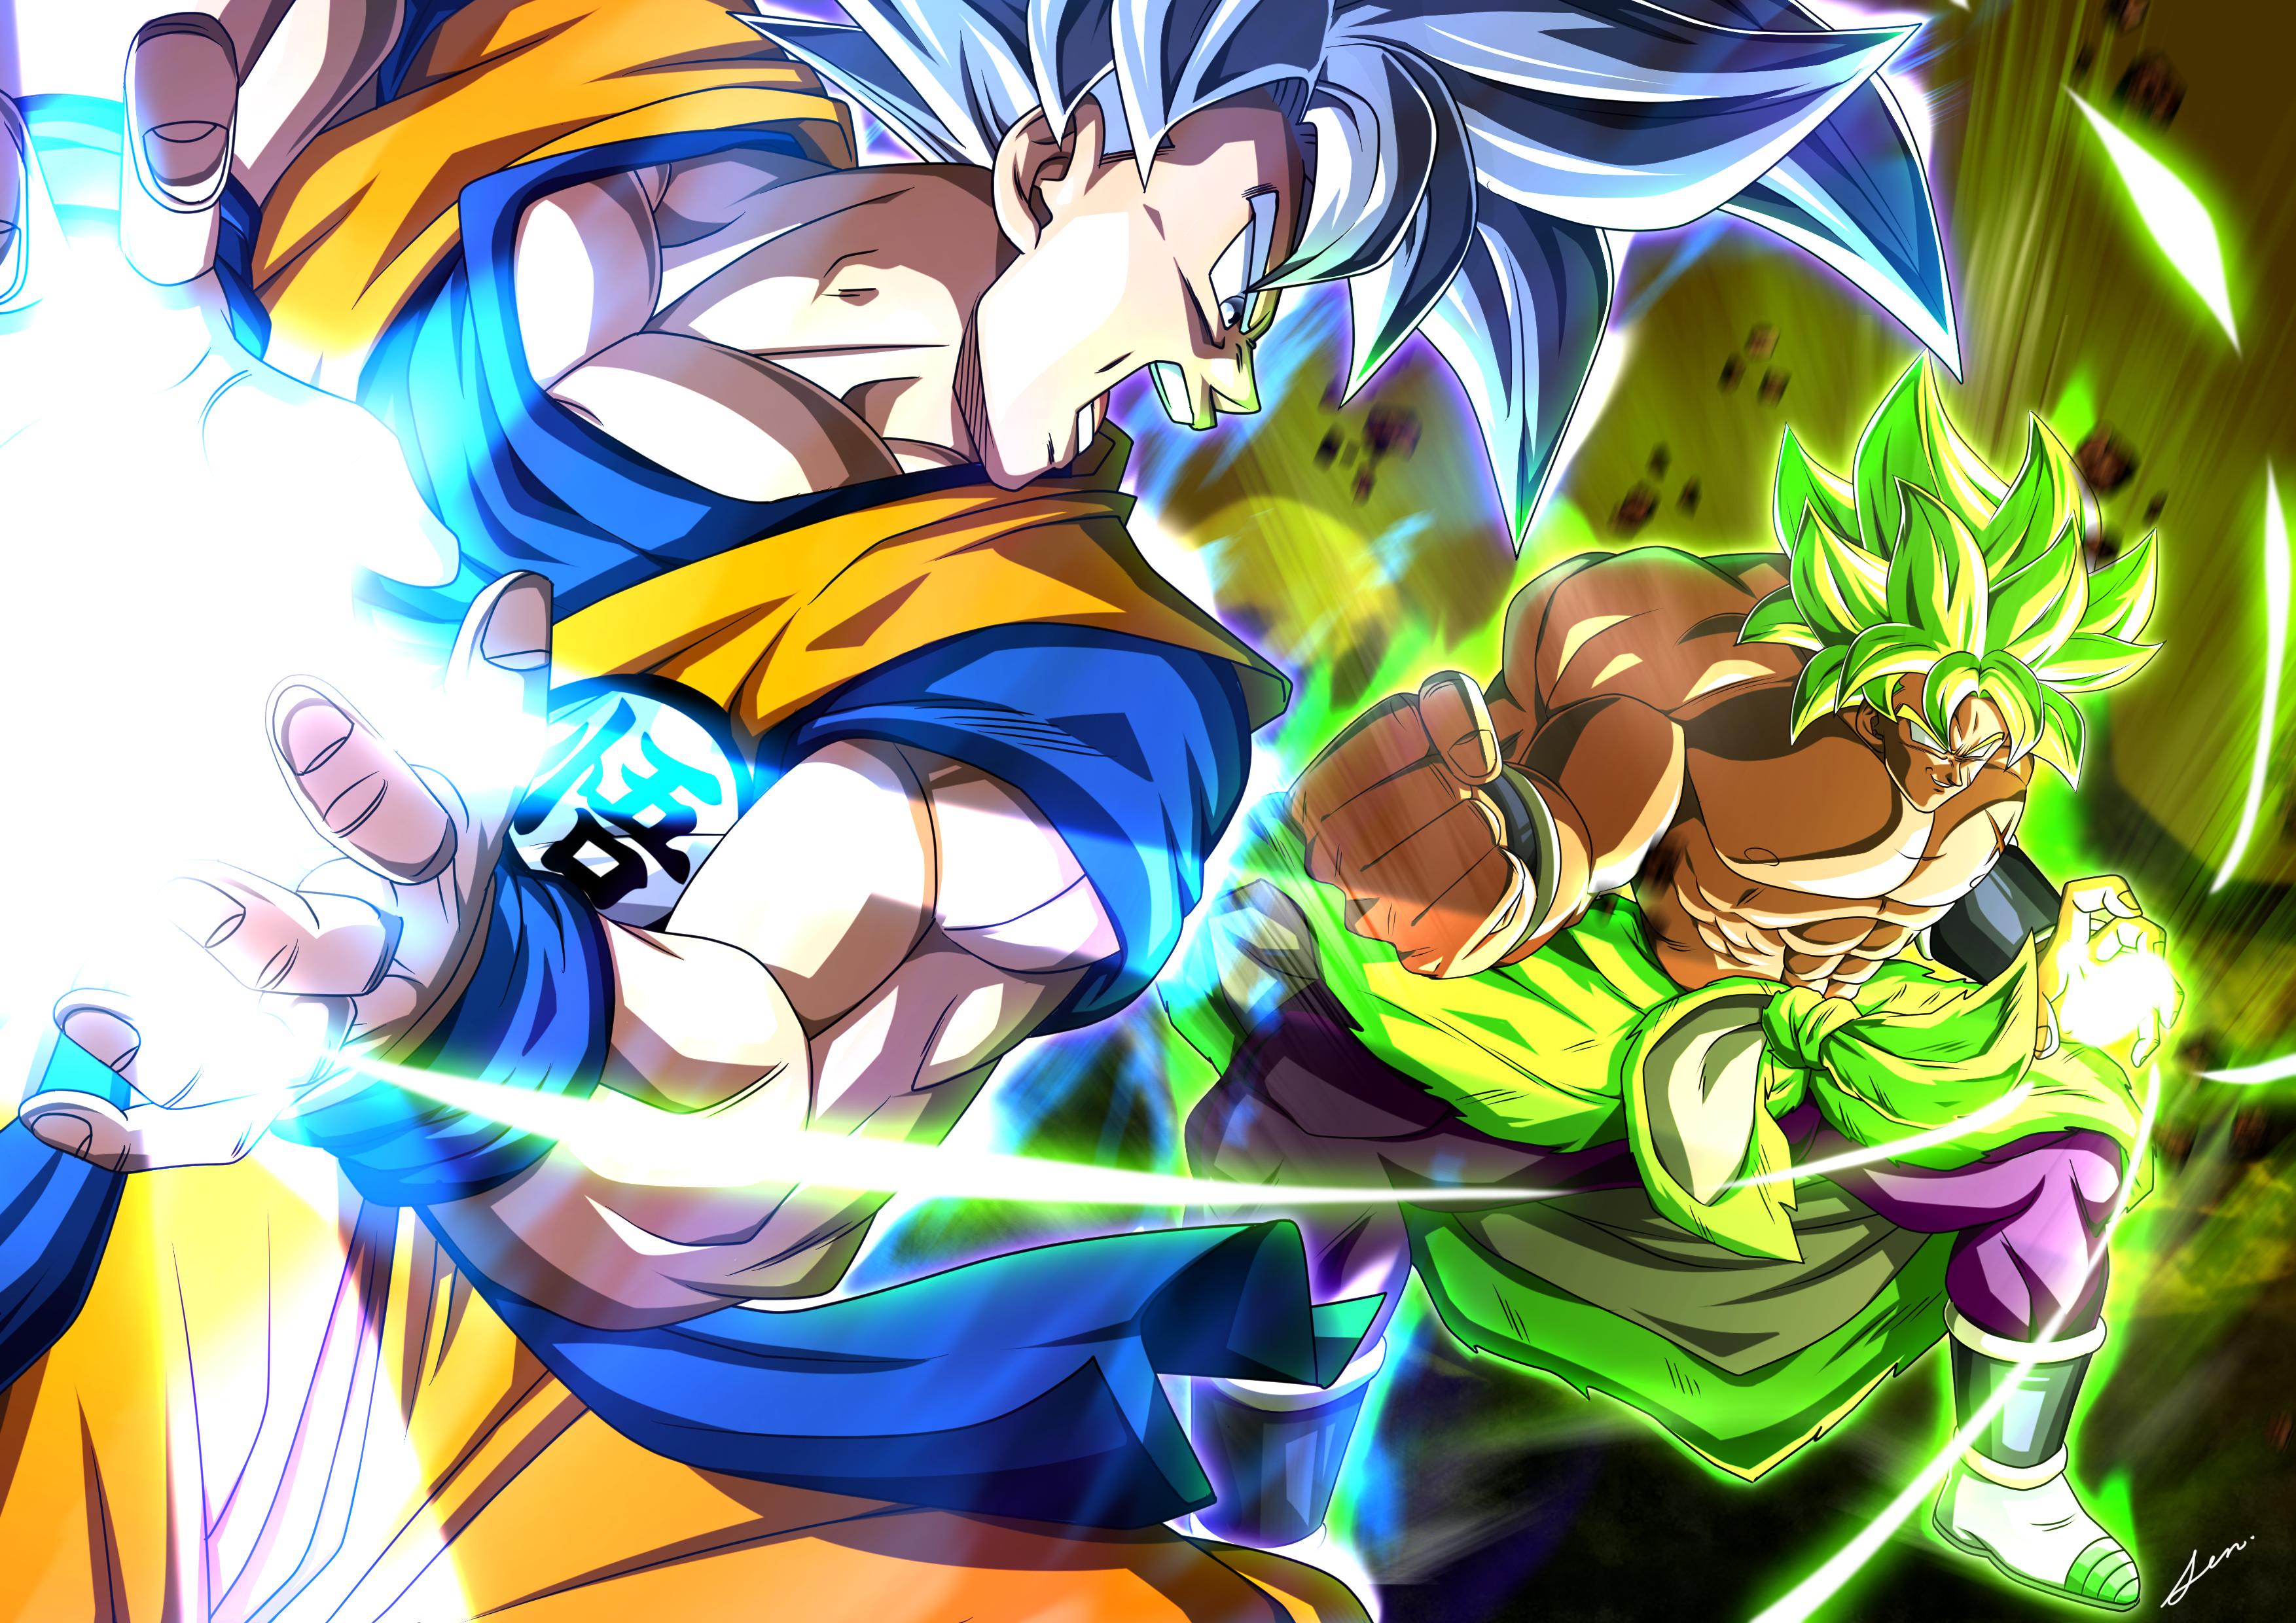 Goku Vs Broly Wallpaper Hd